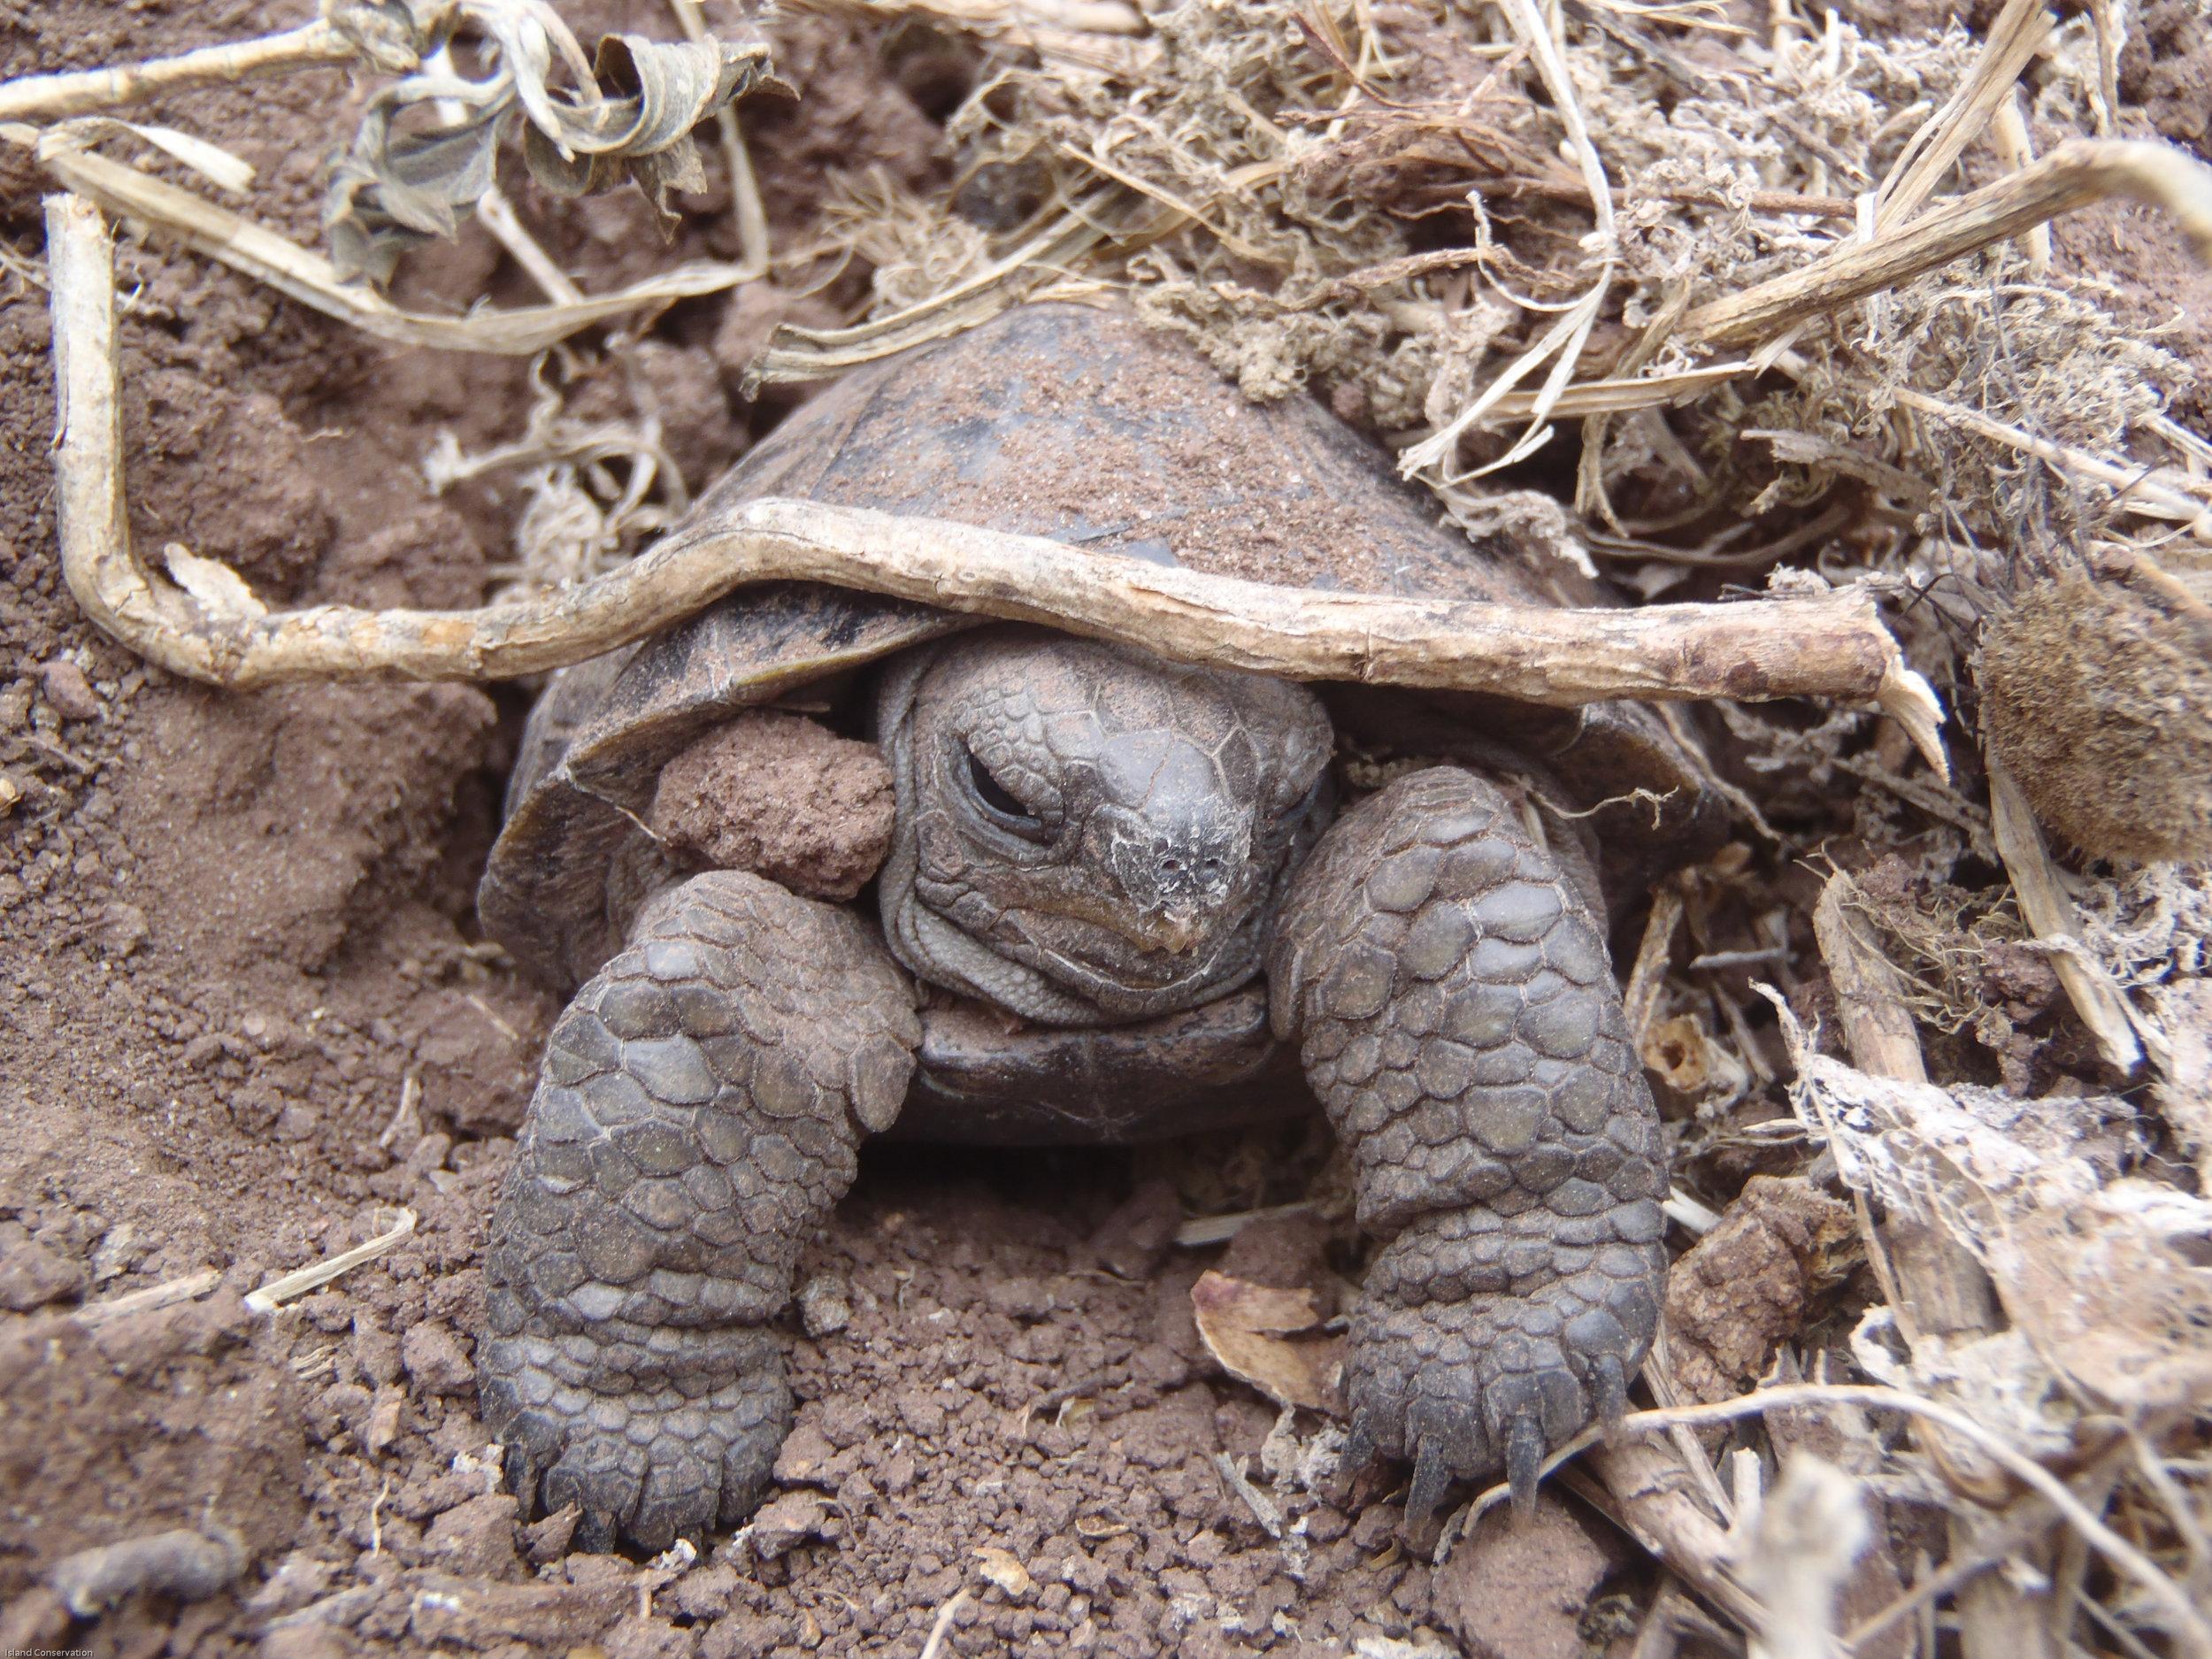 A Pinzon tortoise hatchling in the wild.